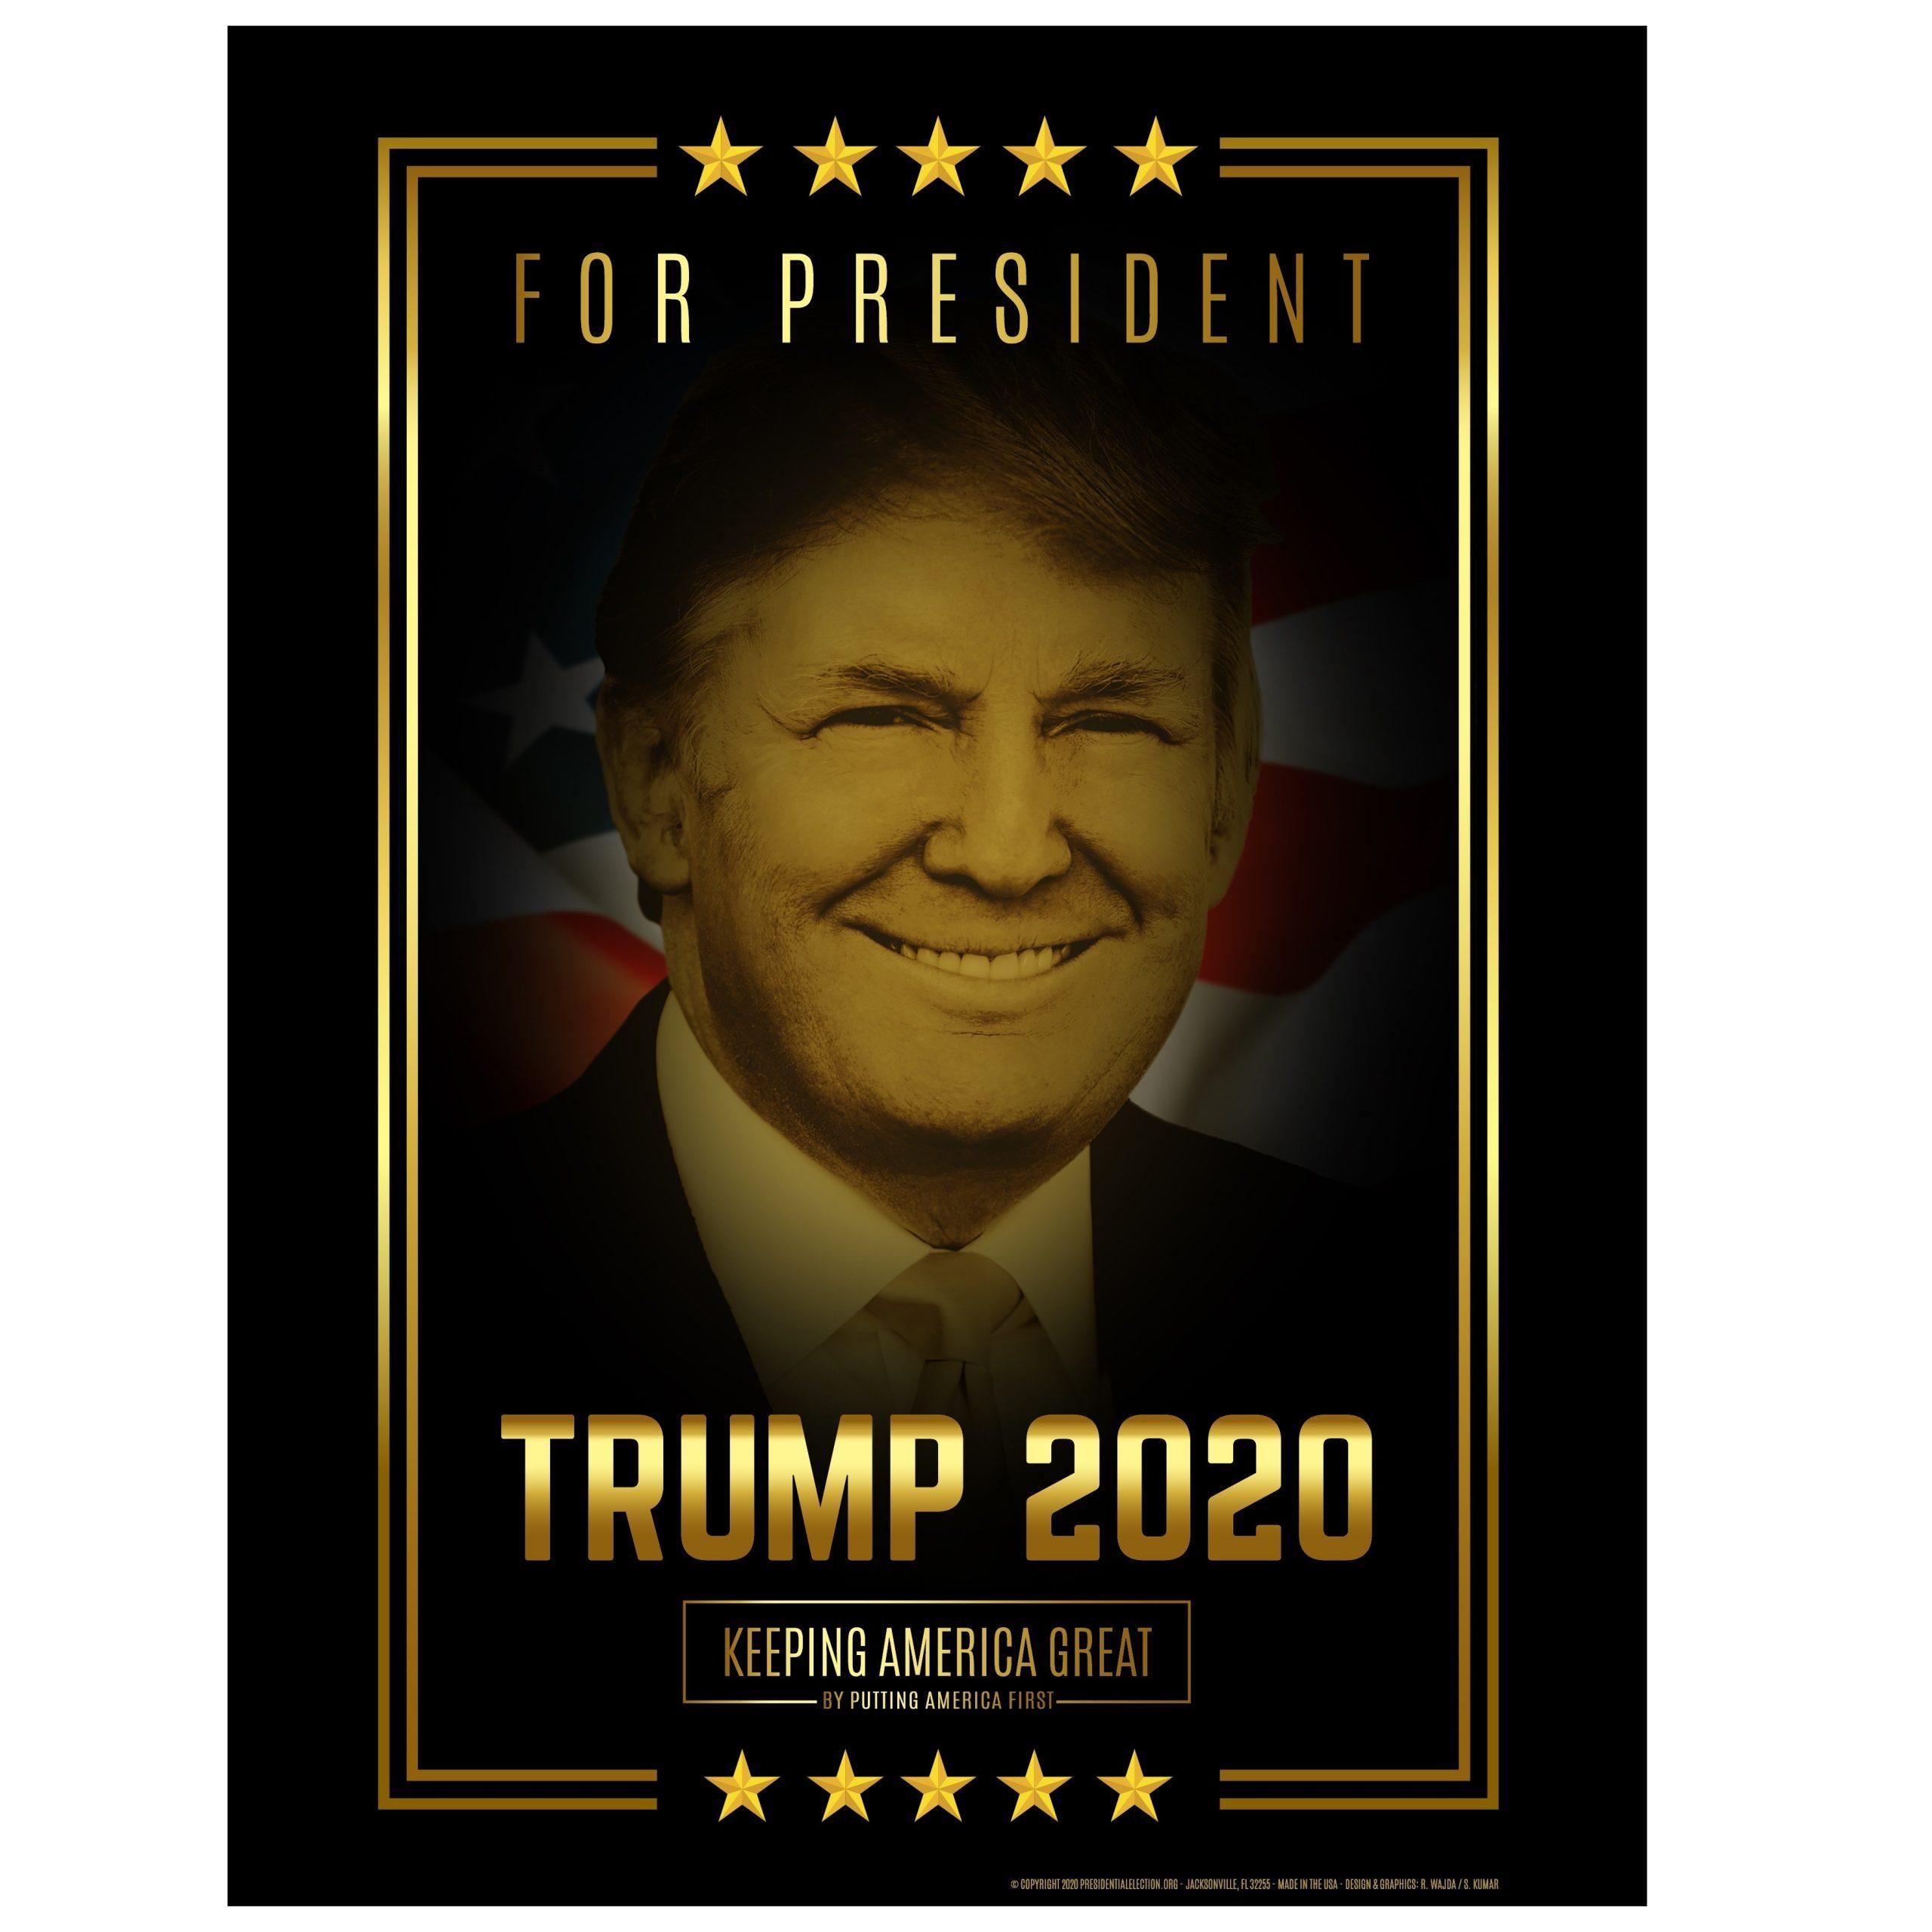 donald trump 2020 wholesale campaign posters